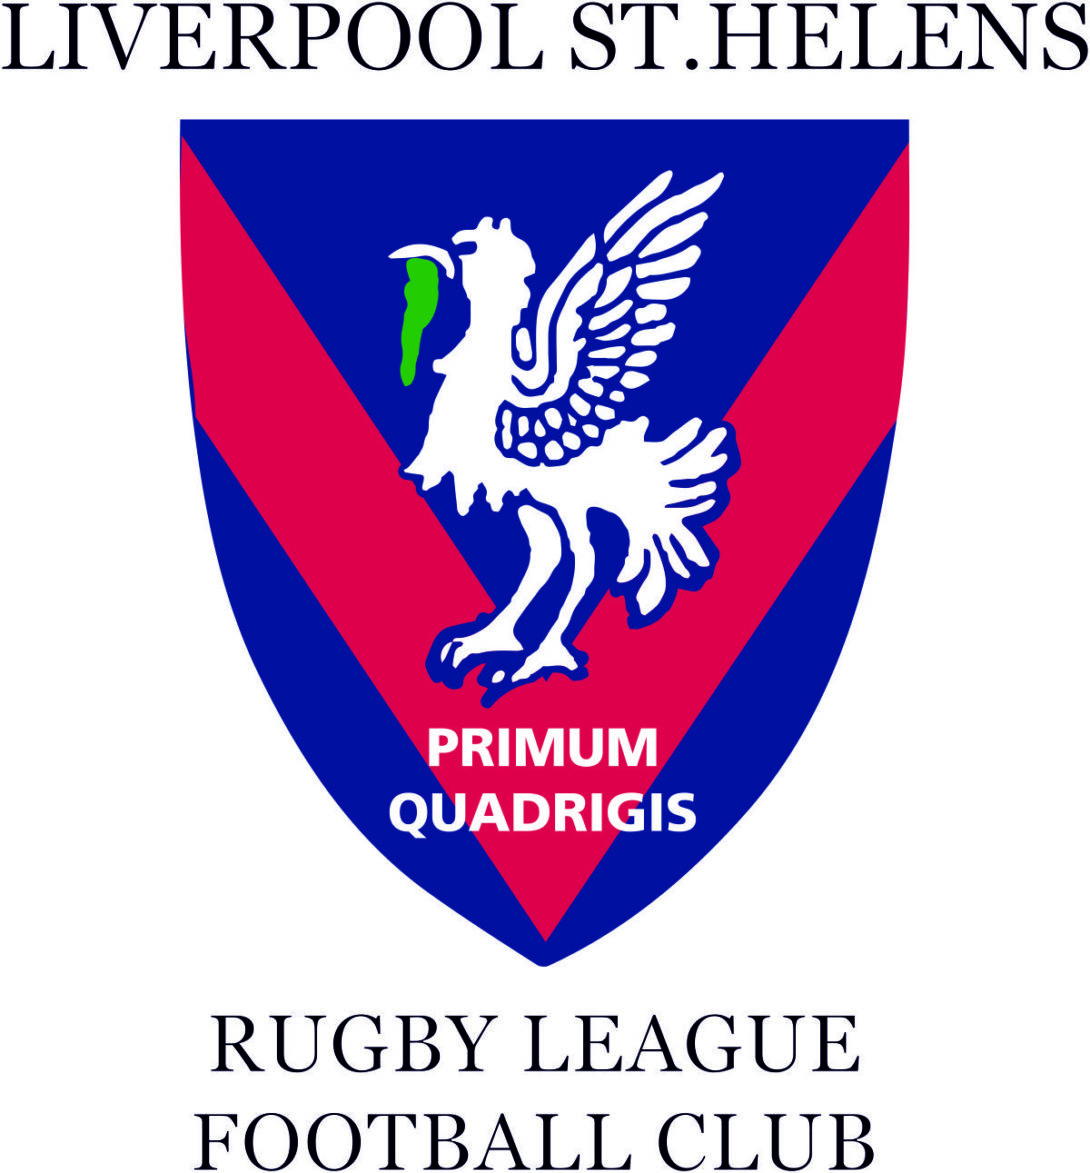 Liverpool St Helens RLFC